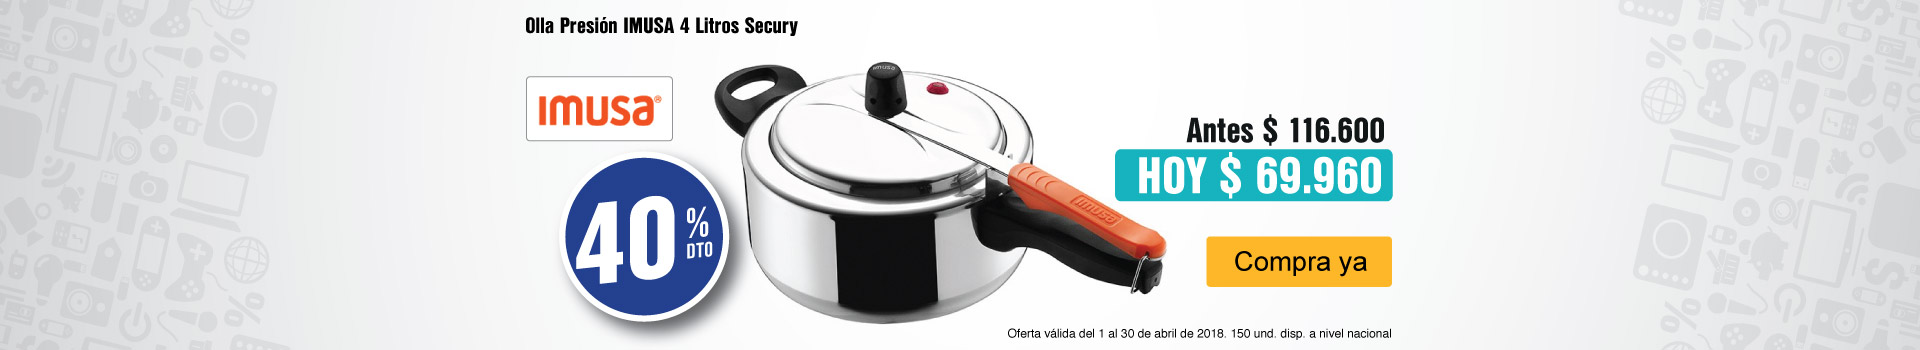 AK-BCAT-1-hogar-PP-imusa-ollapresionsecury4lt-Abr21